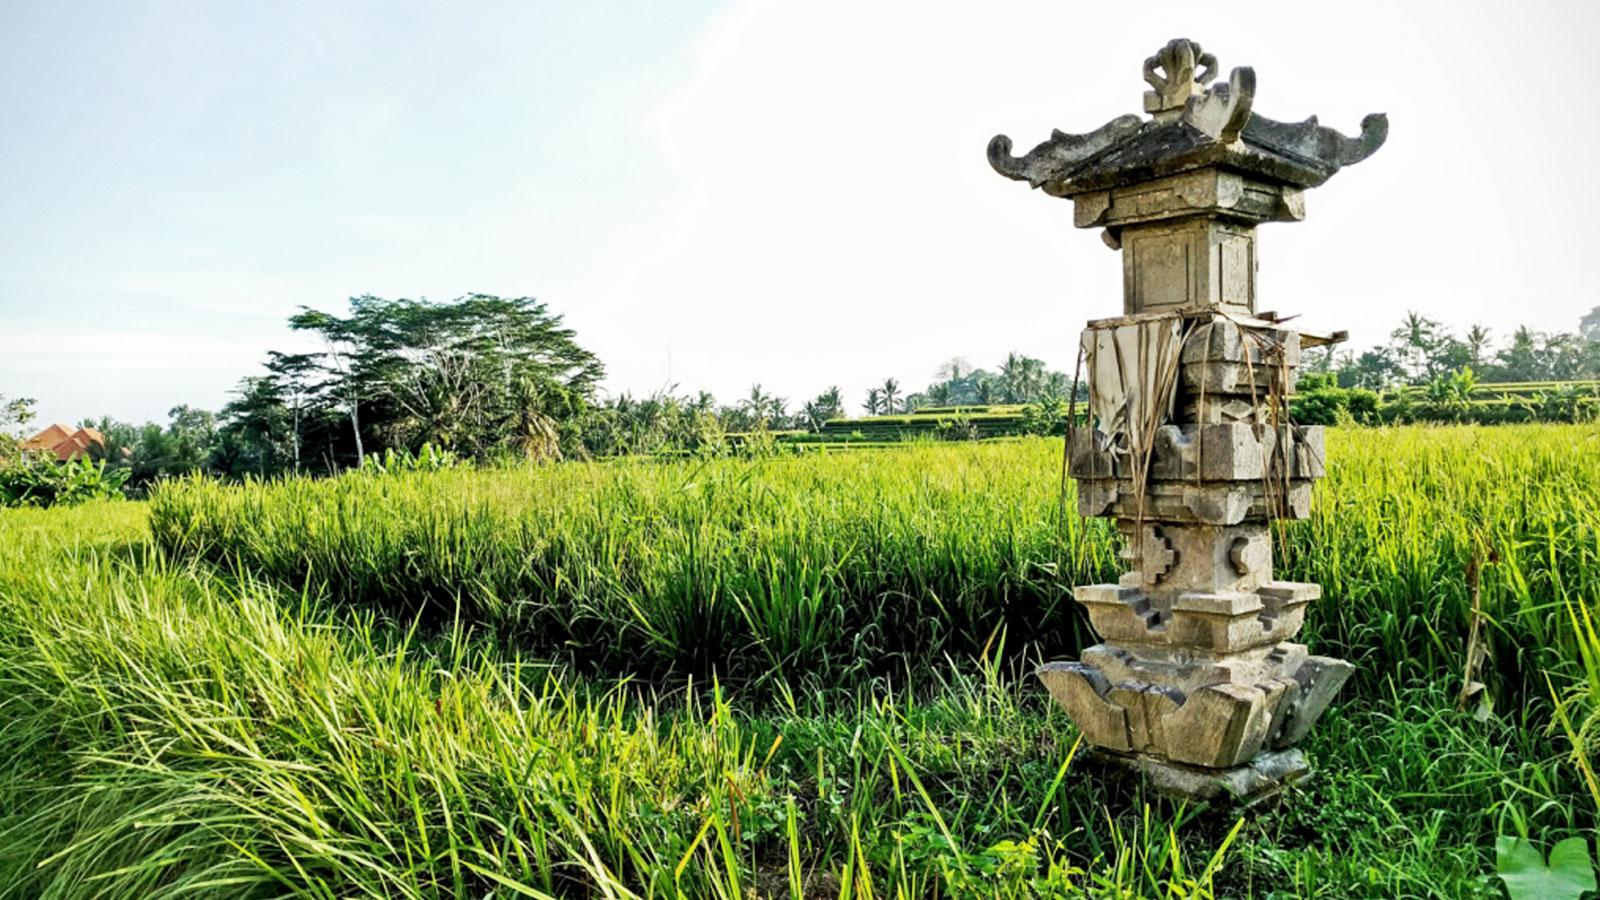 Reisefelder in Ubud auf Bali Erlebnisreise Indonesien traveljunkies